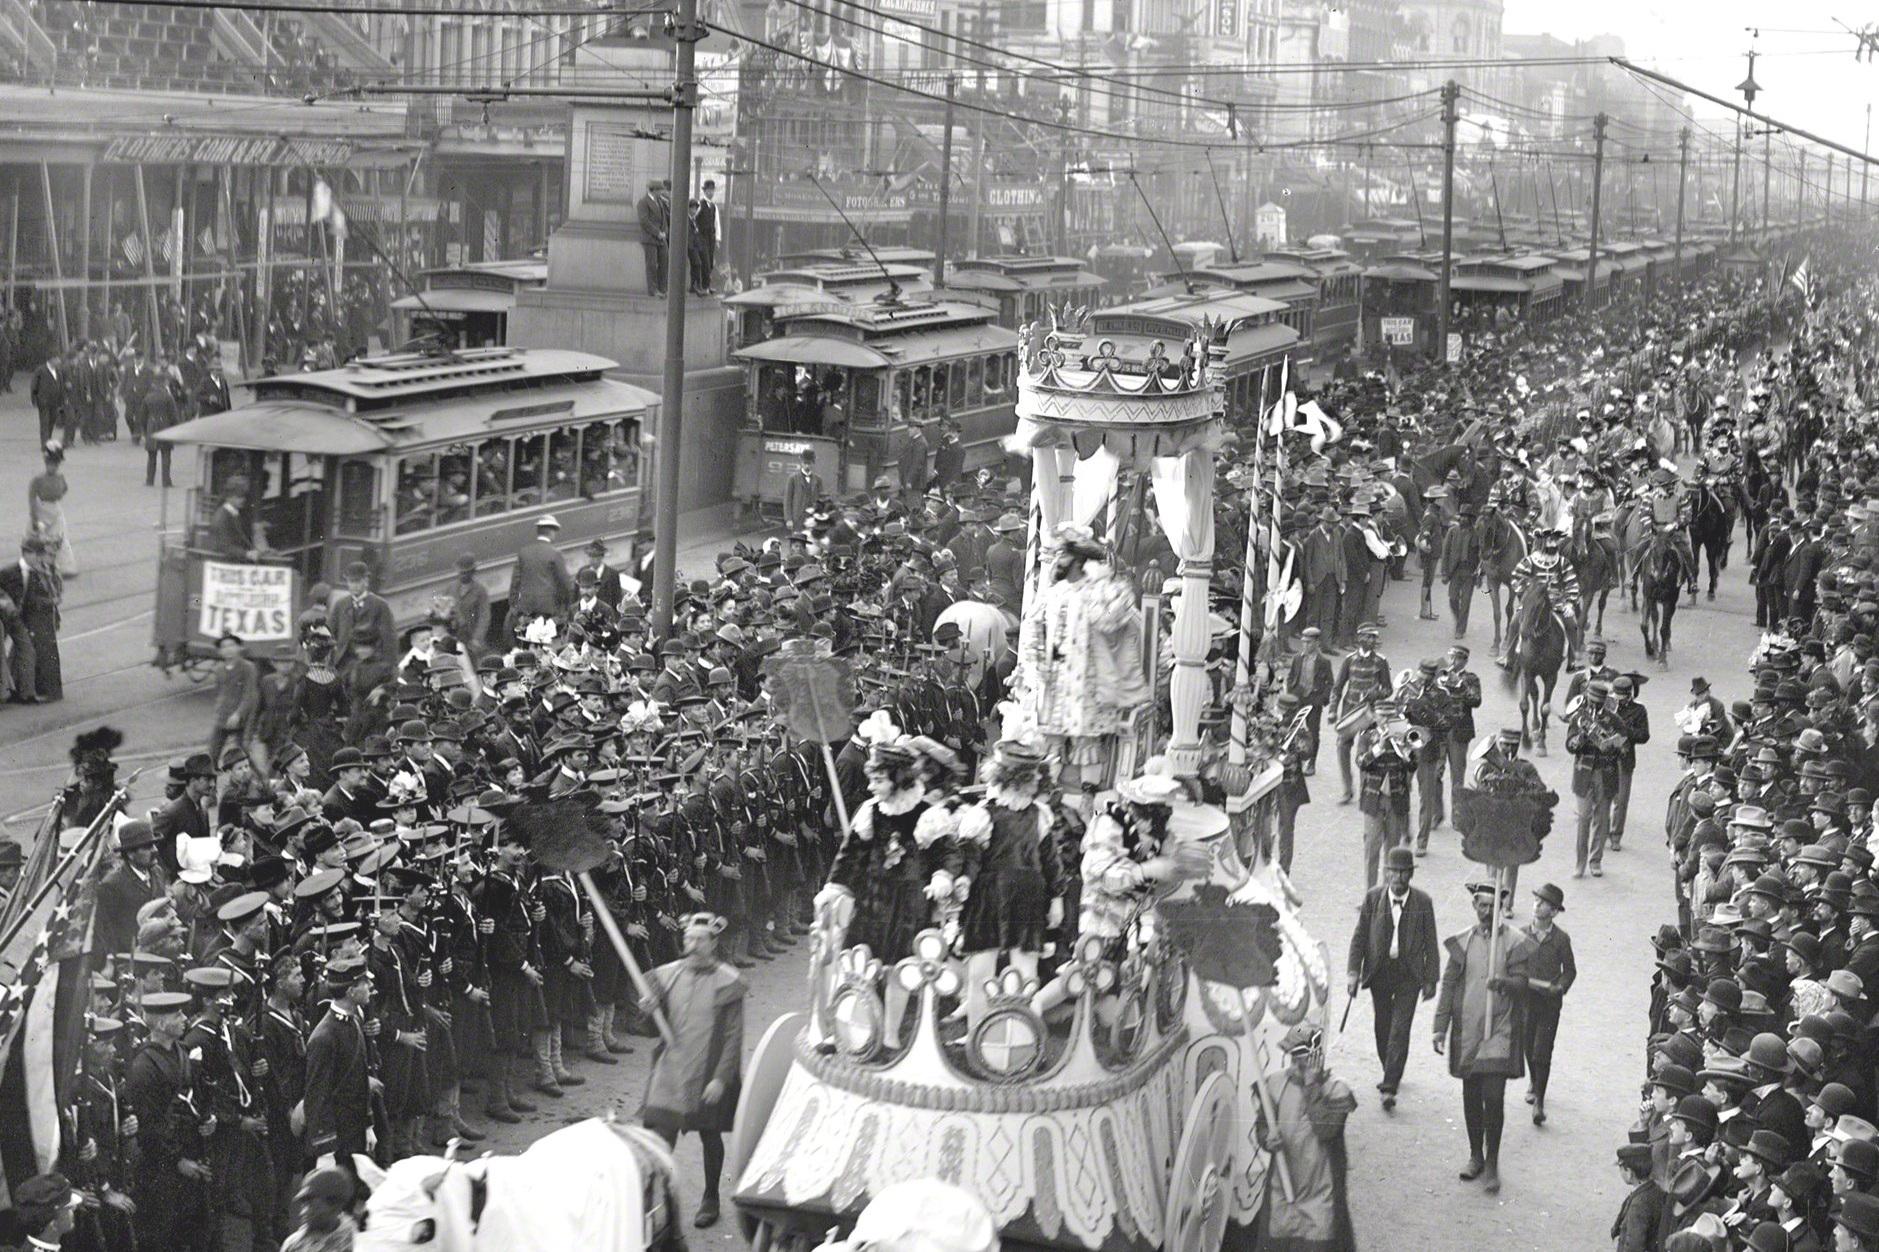 Mardi Gras Feb. 27th, 1900